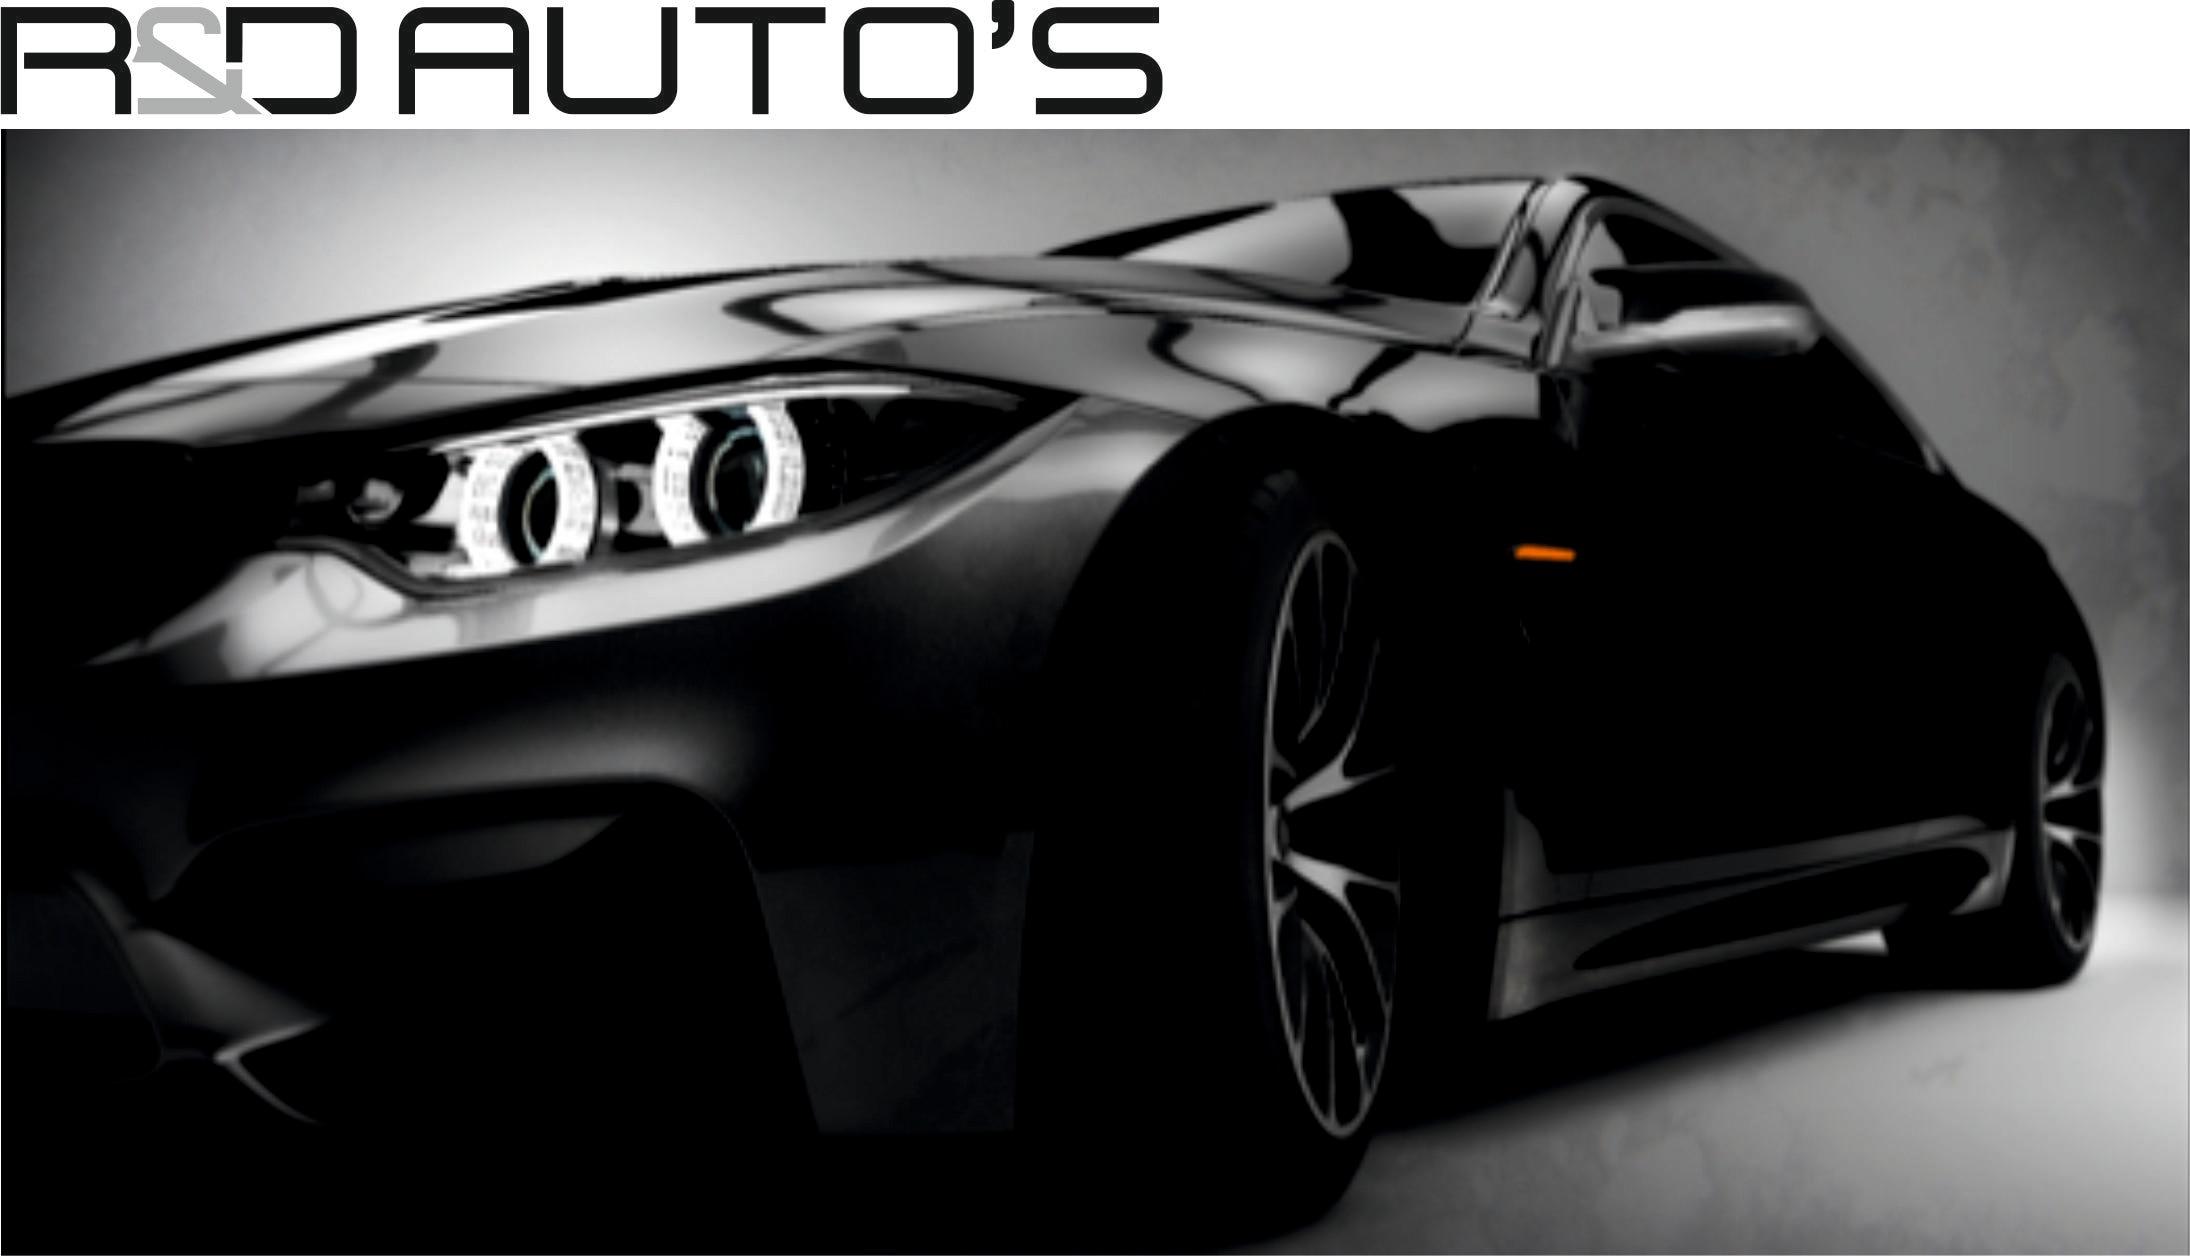 R&D Auto's